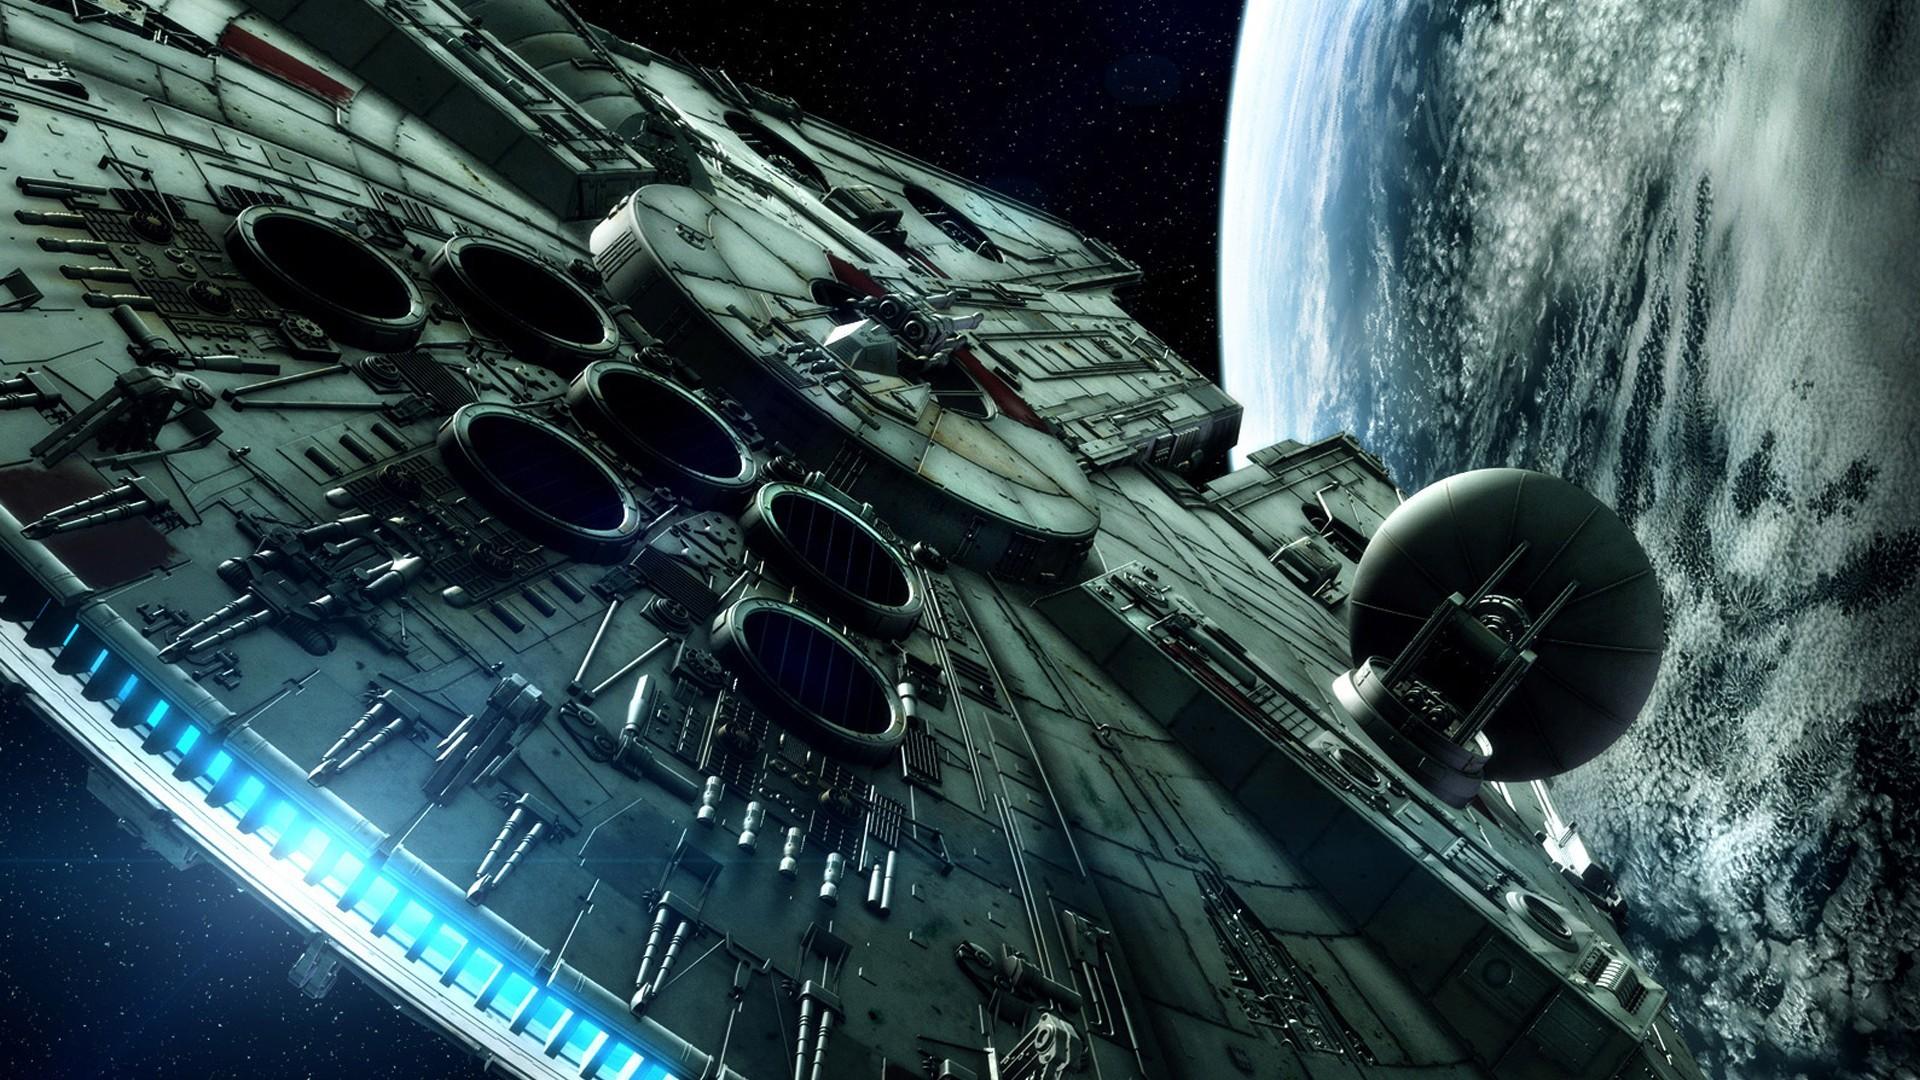 35 units of Wallpaper Star Wars 7